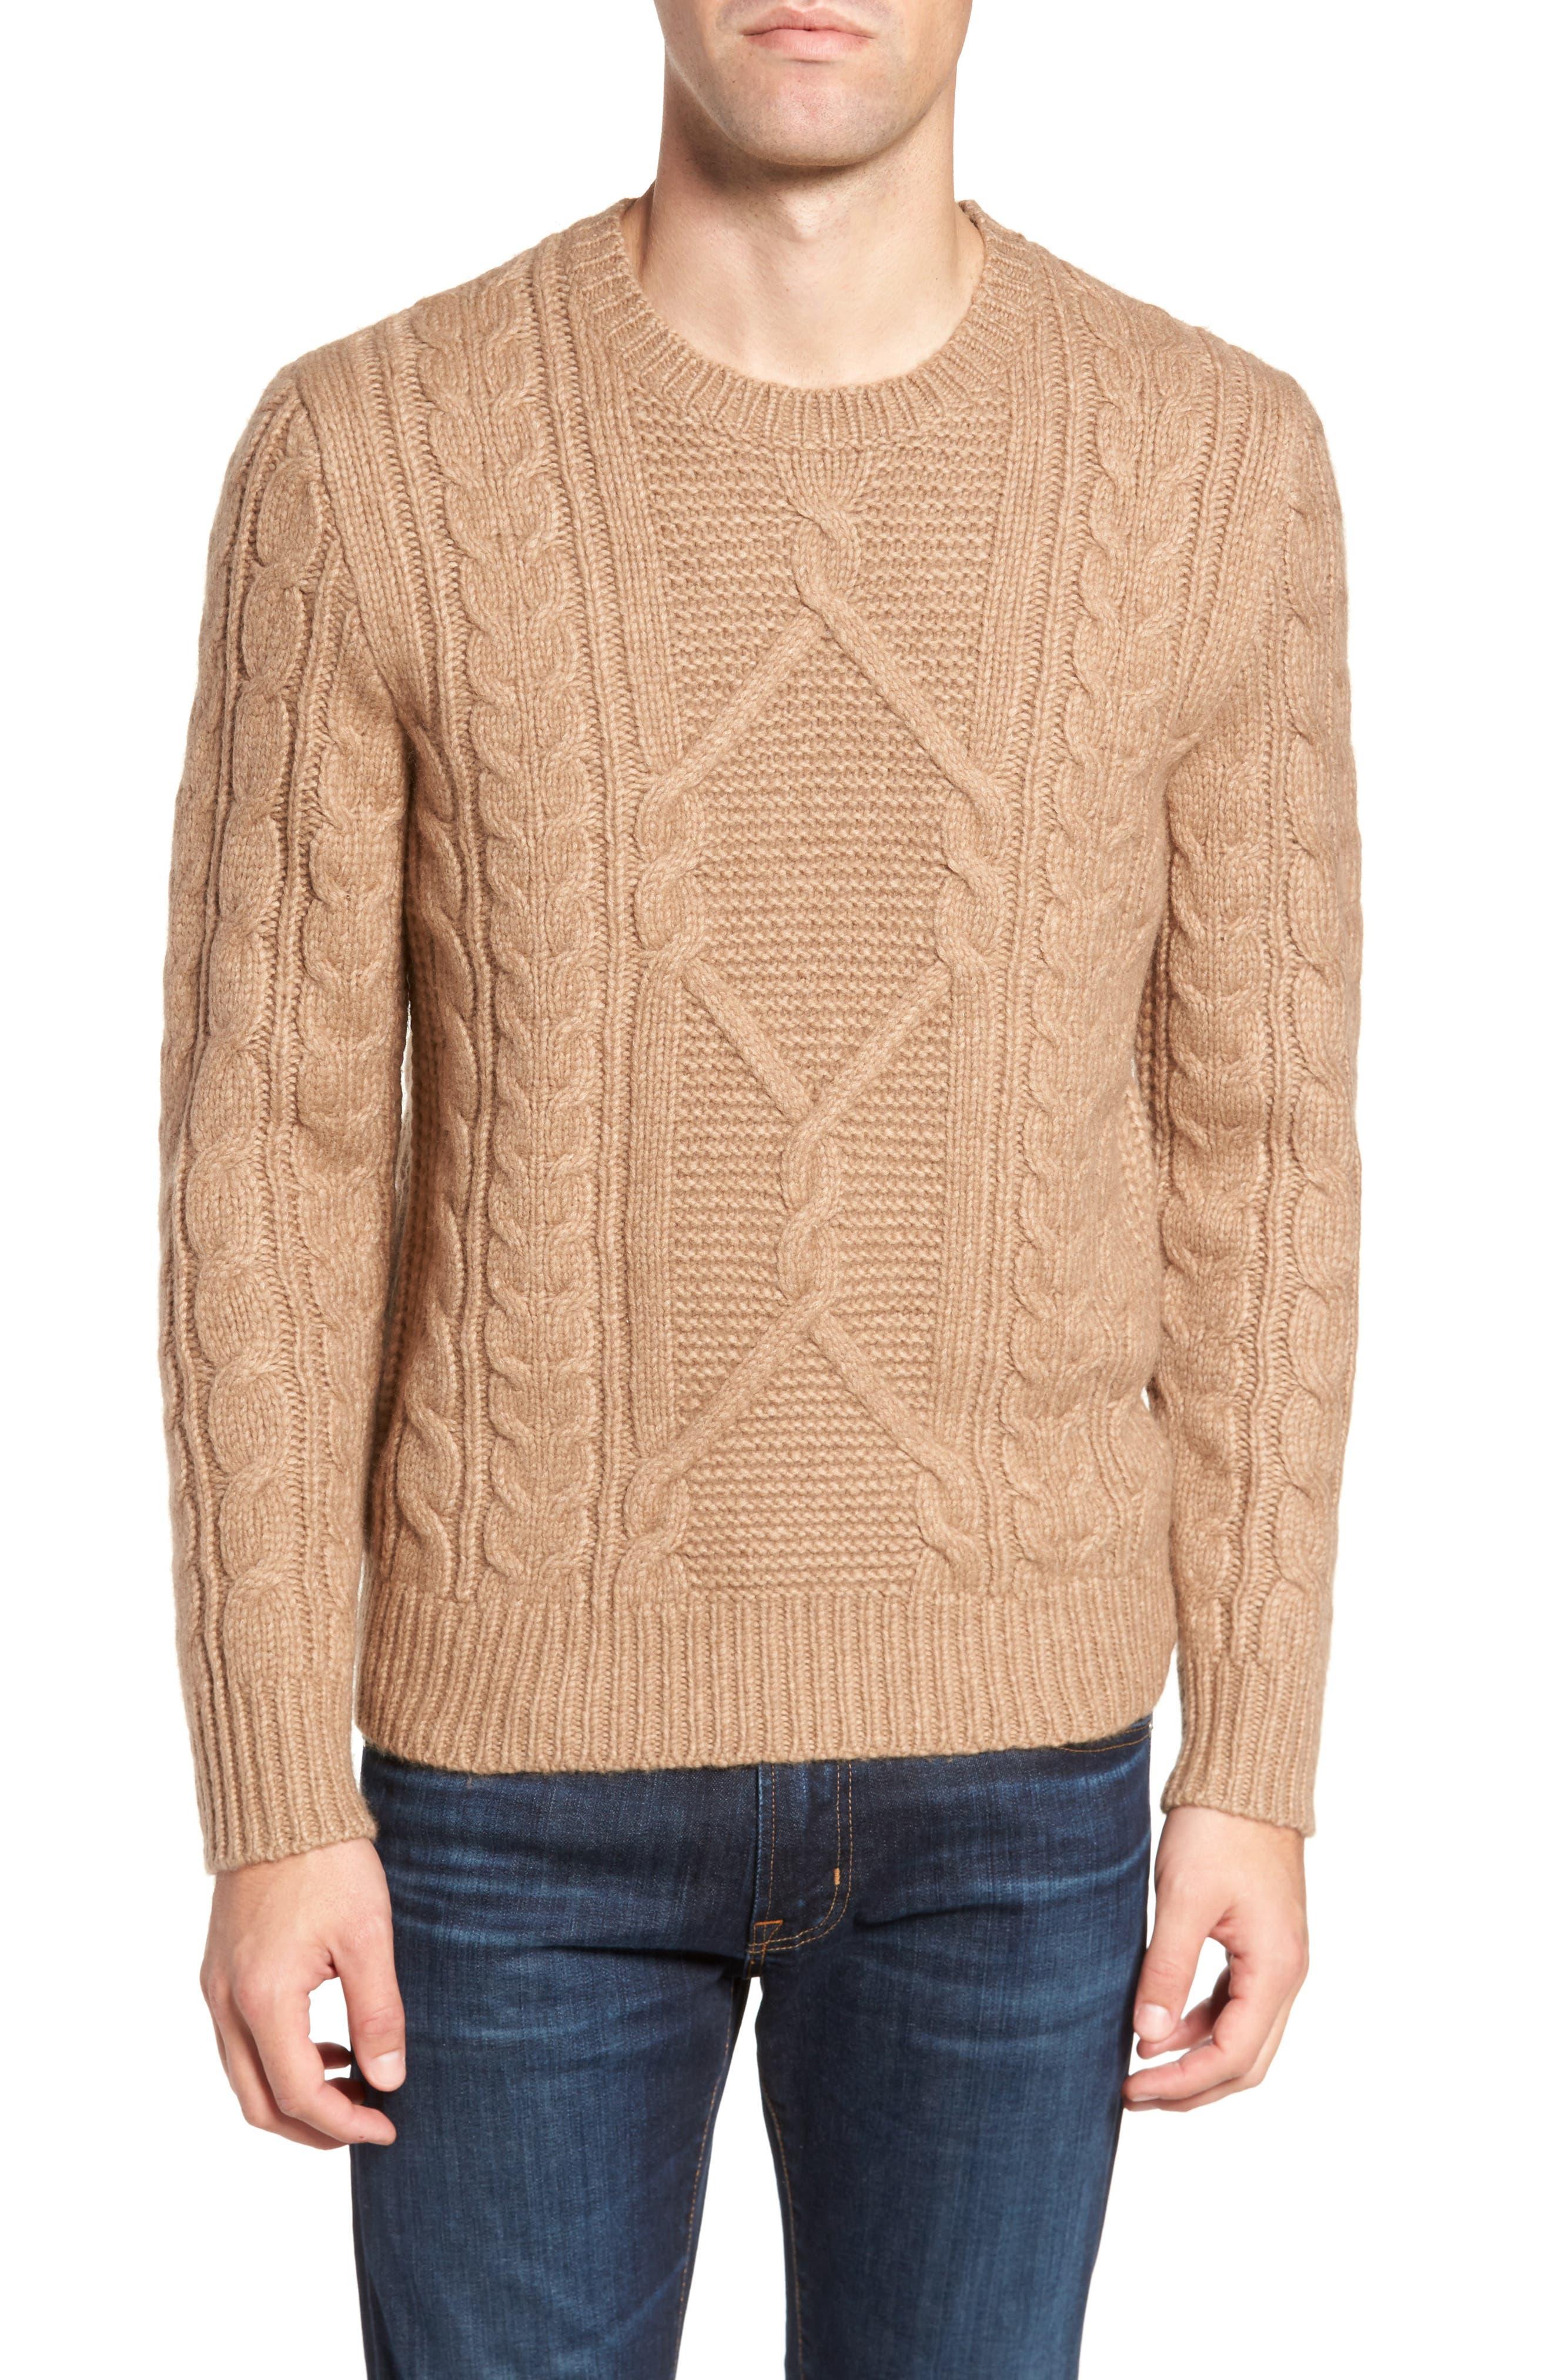 Cable Knit Crewneck Sweater,                             Main thumbnail 1, color,                             Camel